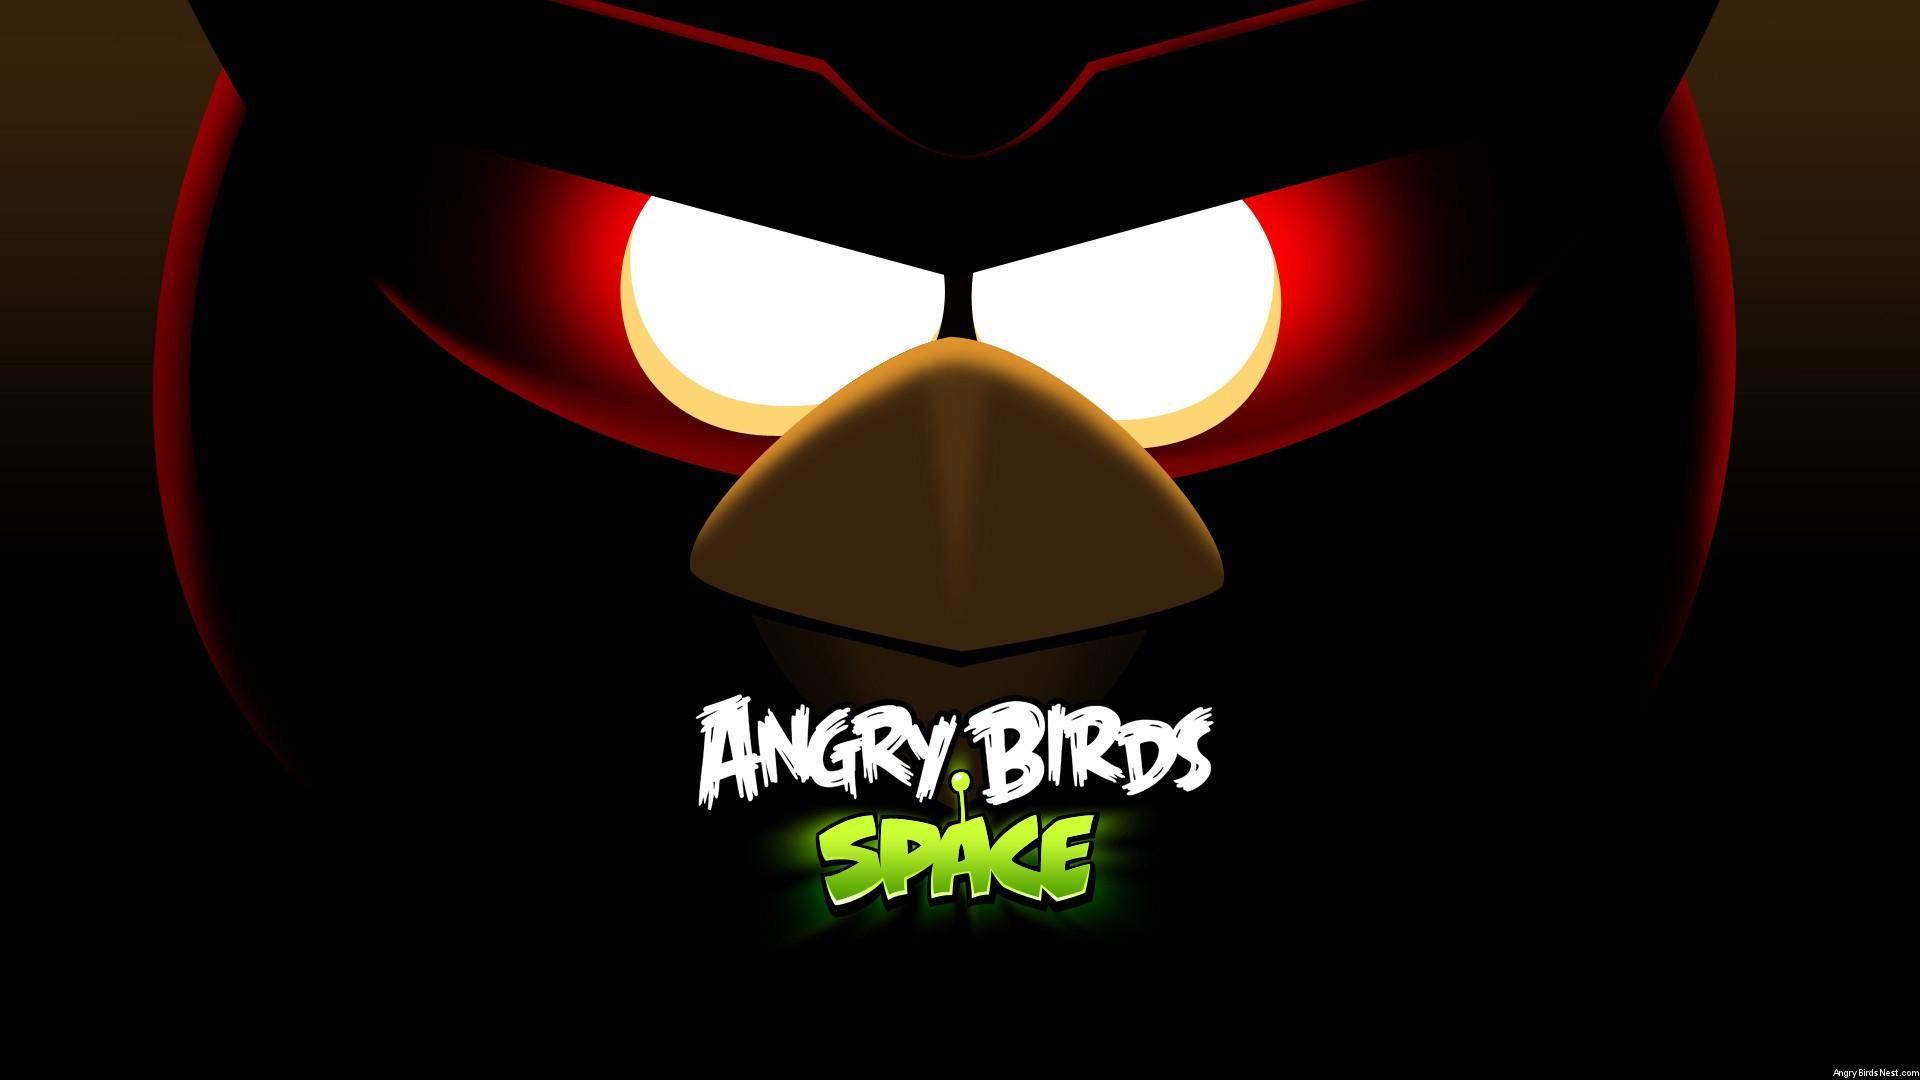 Angry Birds Space Red Bird Eyes Desktop Wallpaper 1920x1080